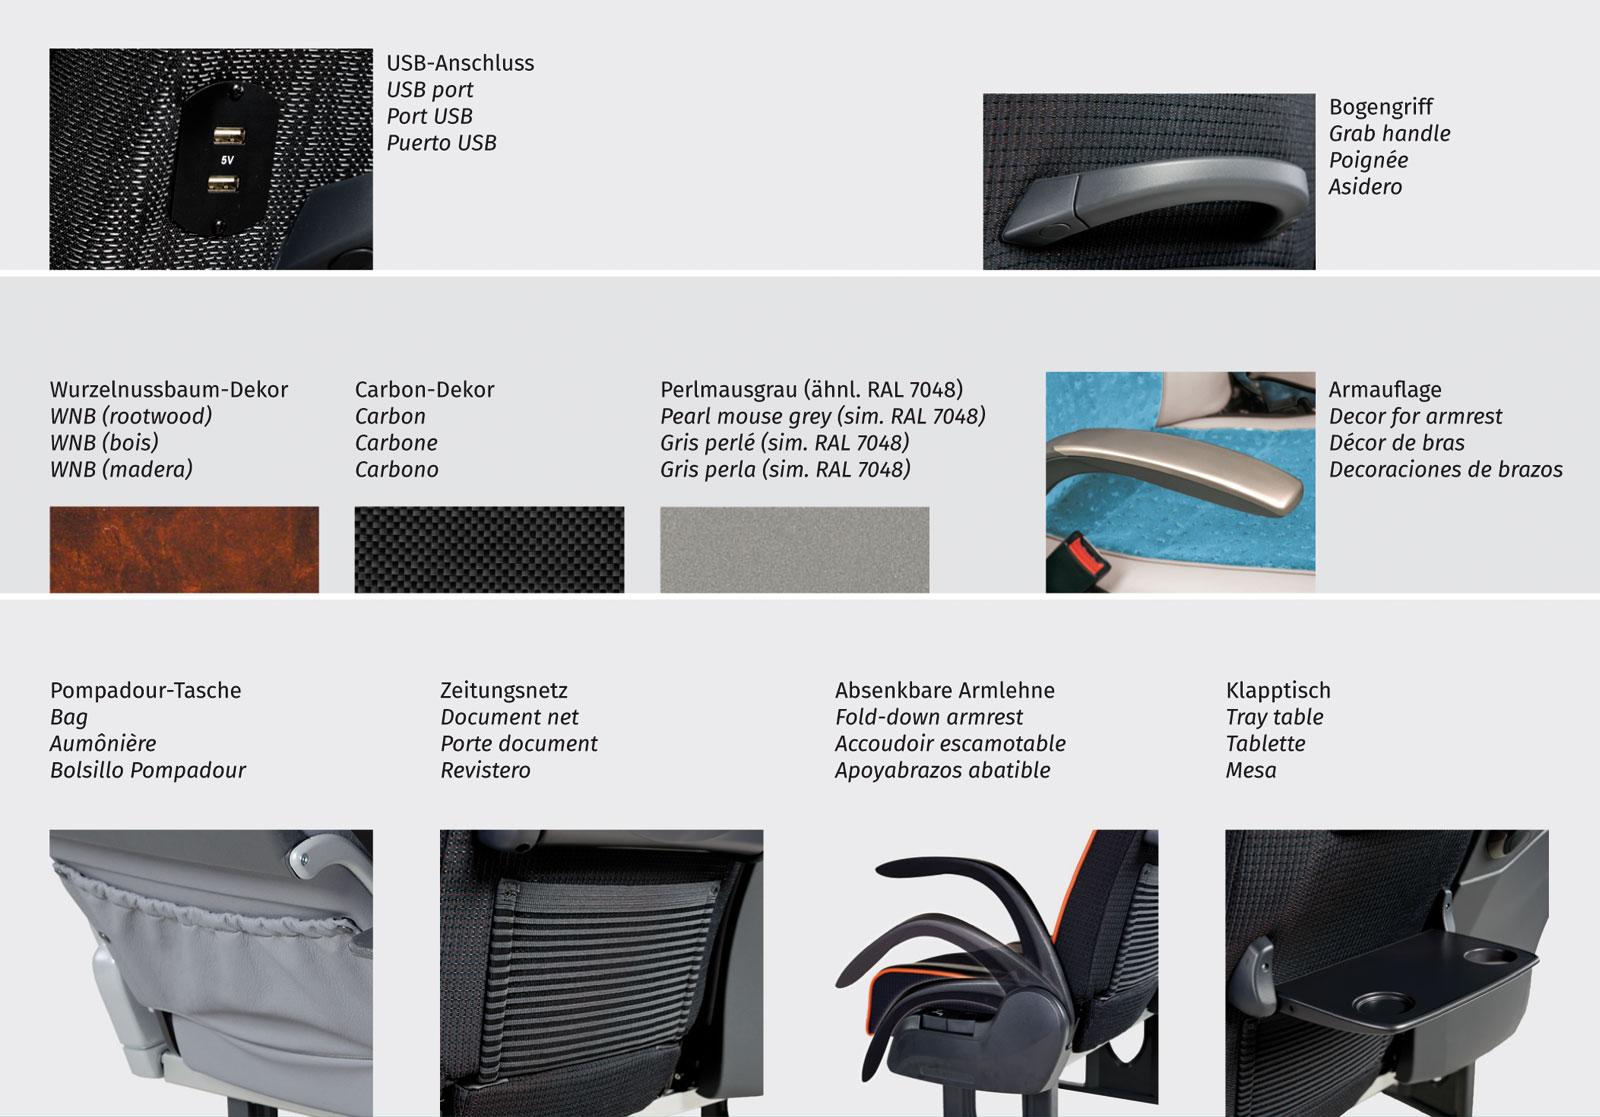 LS30 | Accessories